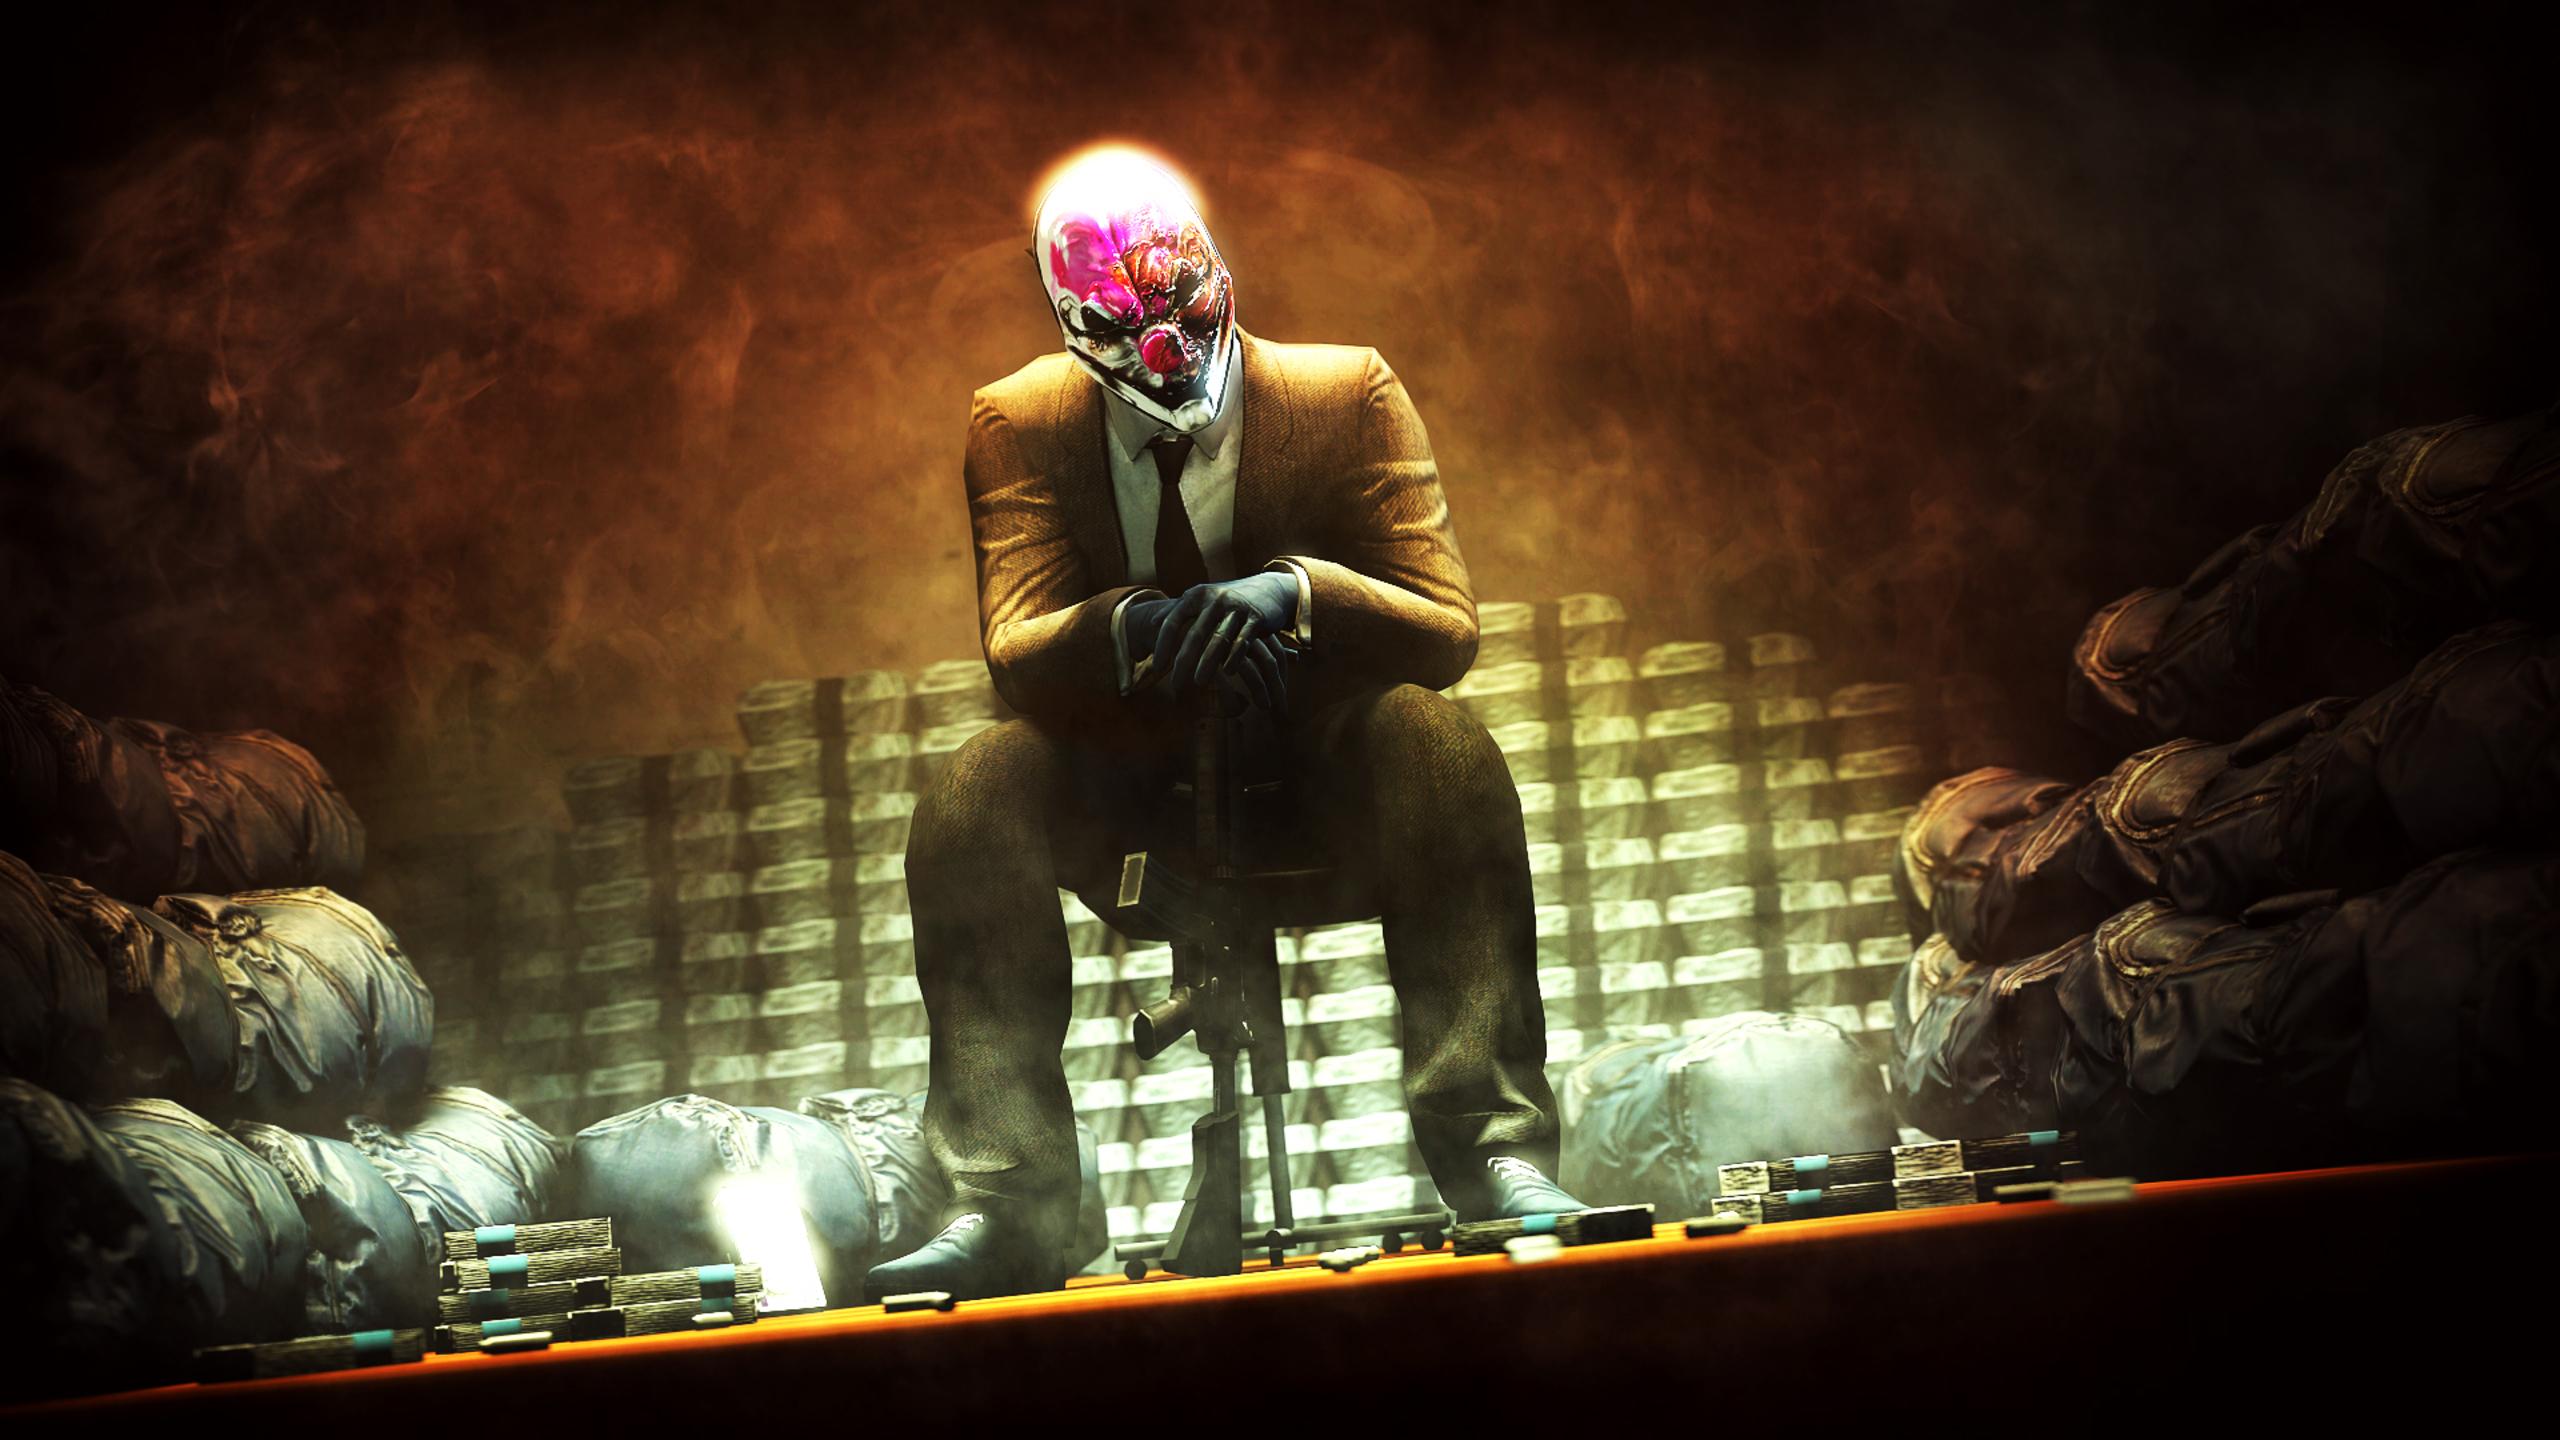 Payday  Joker On Jpg